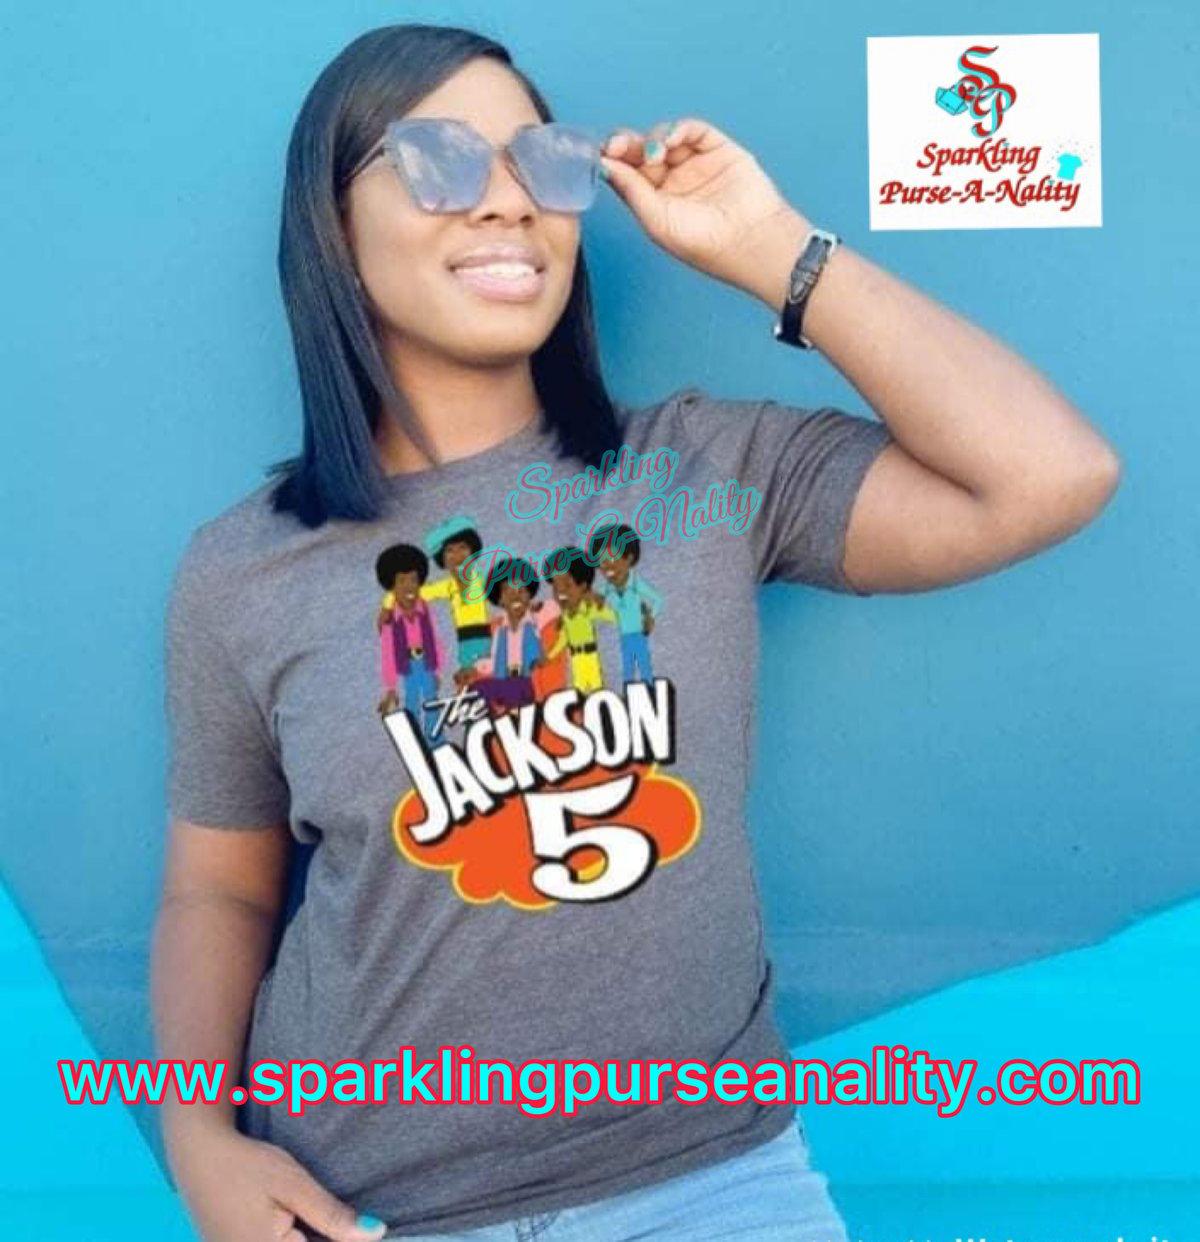 Image of The Jackson 5